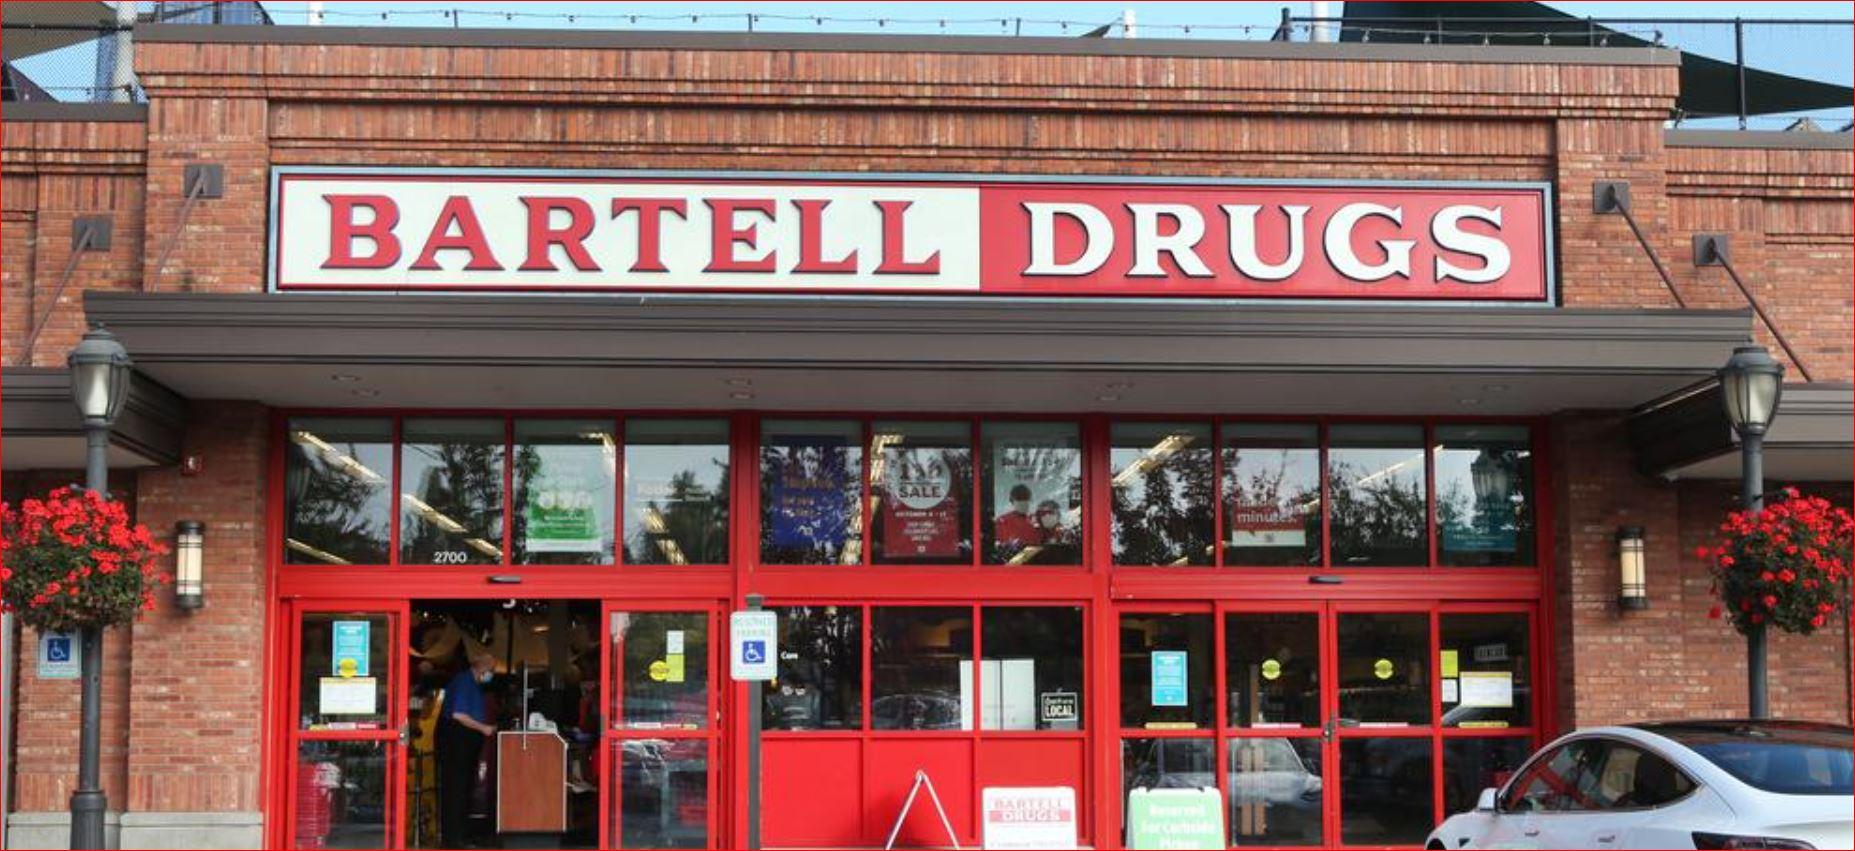 Bartell Drugs Customer Opinion Survey